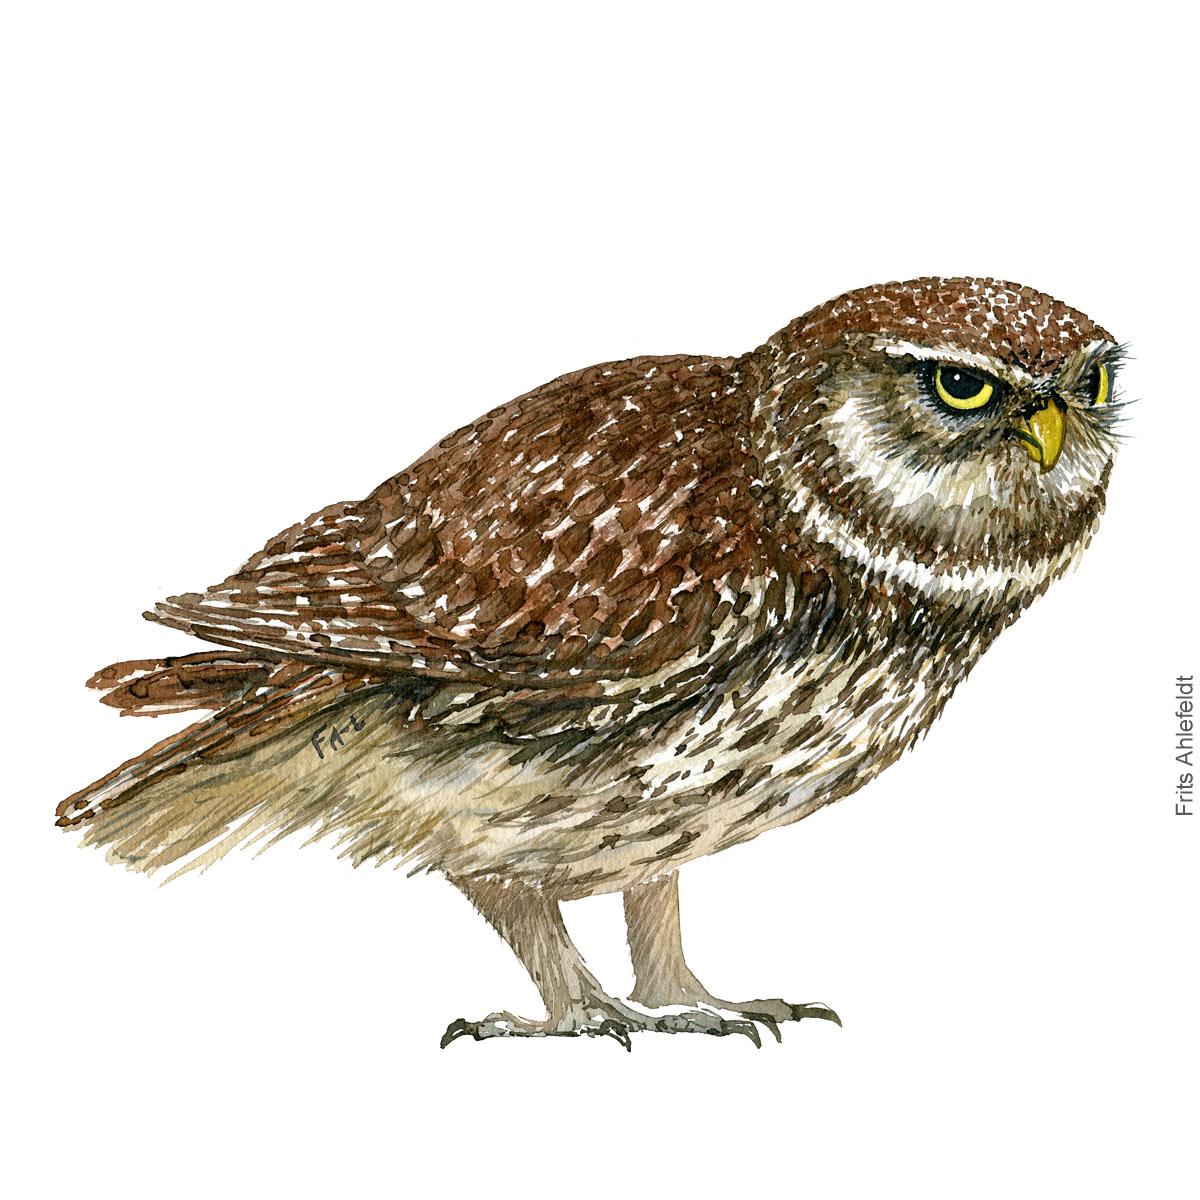 Little owl - Kirkeugle Akvarel. Watercolor bird illustration by Frits Ahlefeldt